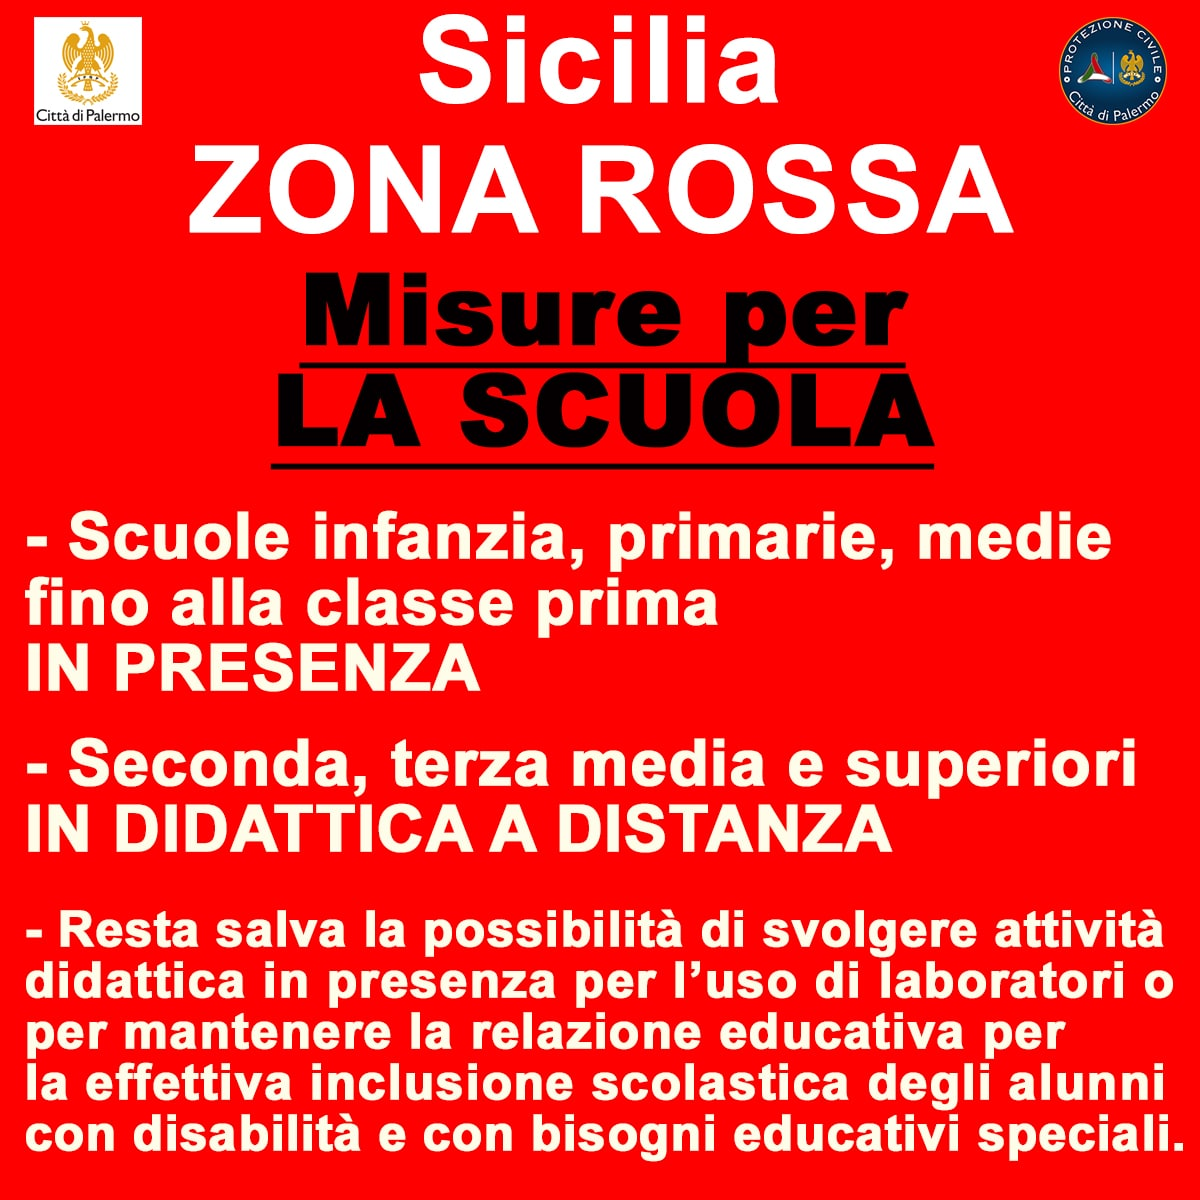 Sicilia zona Rossa - 1